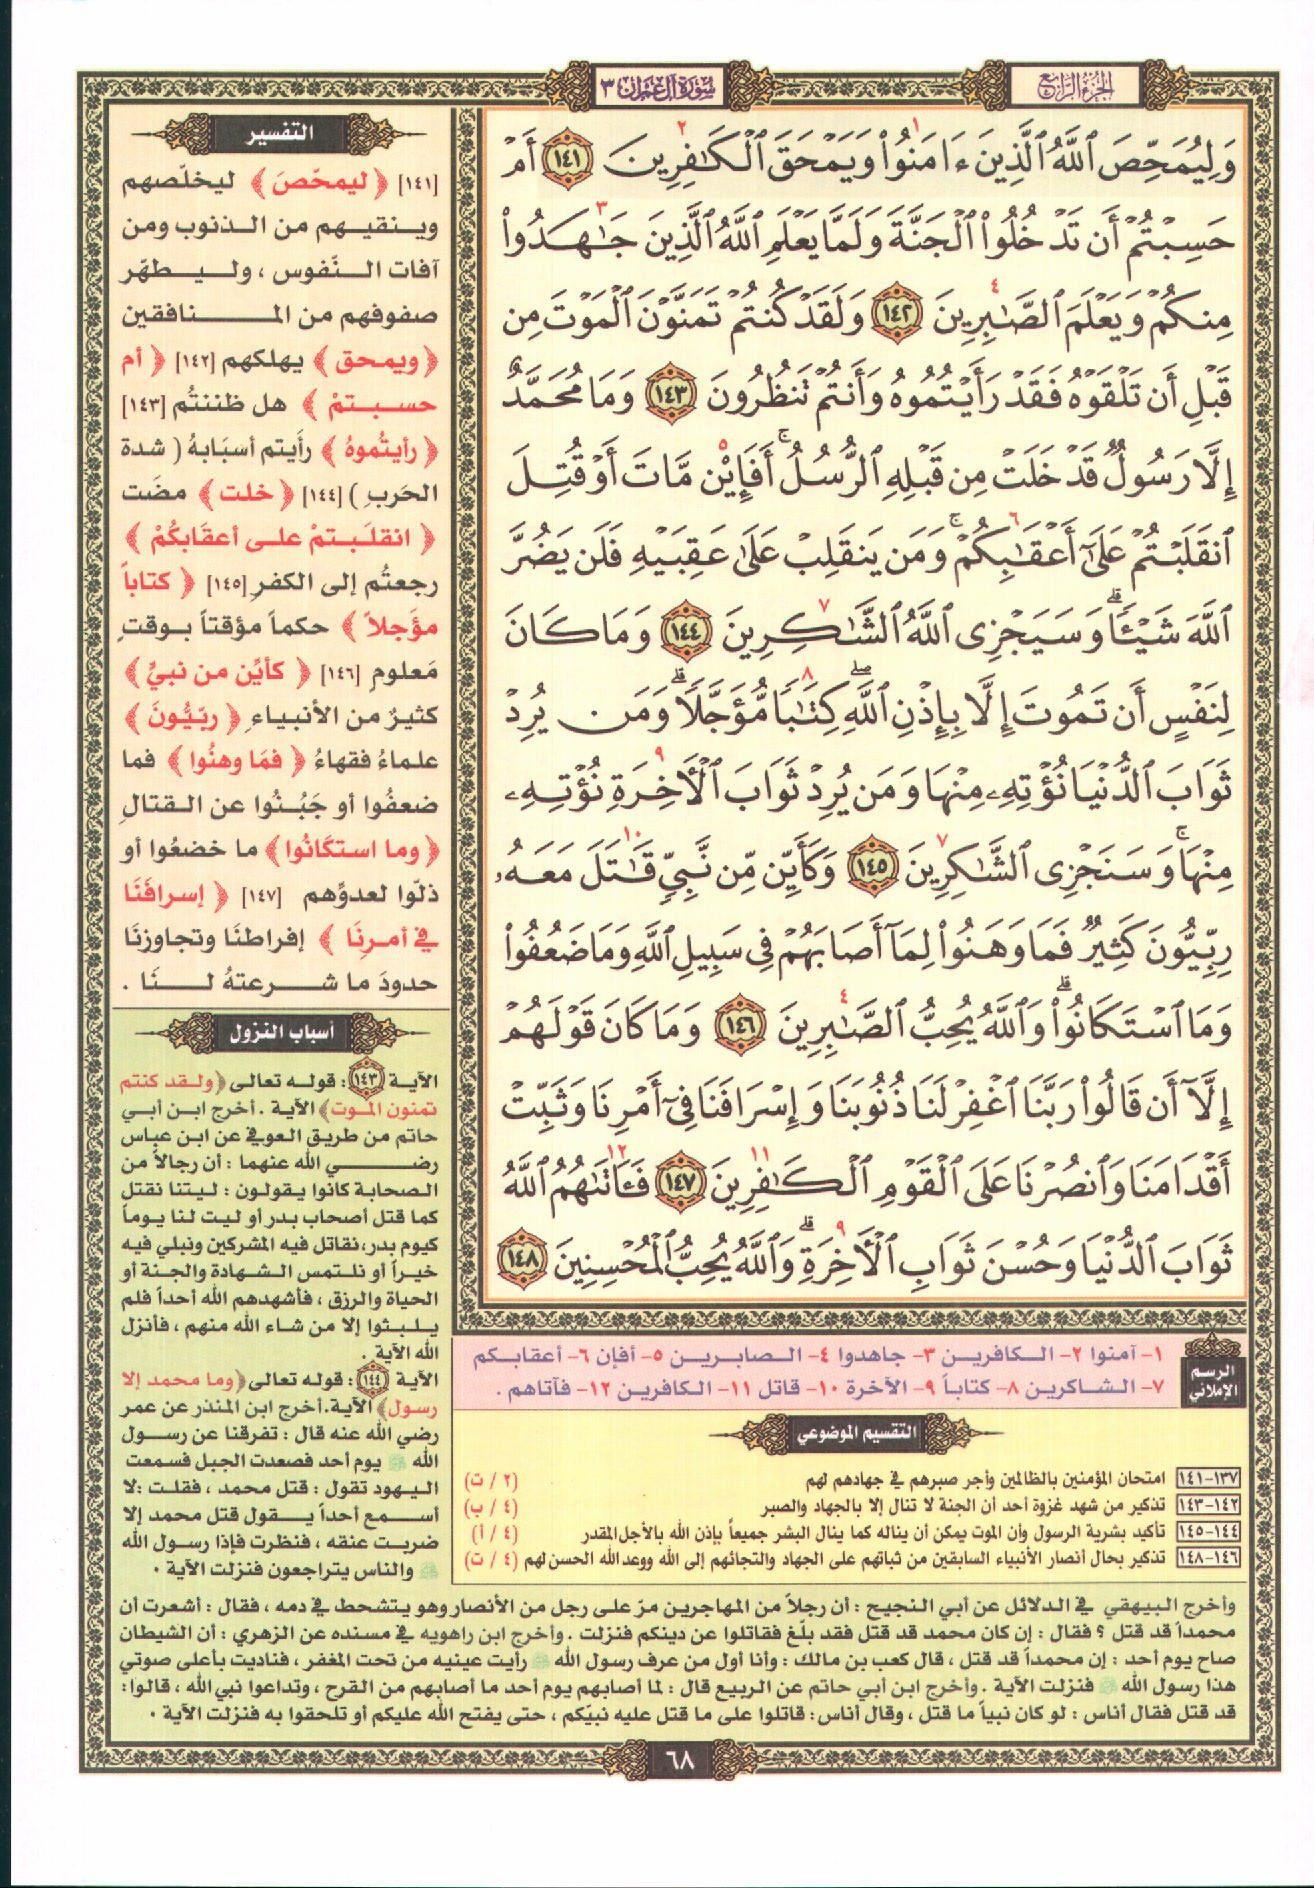 Pin By القران الكريم The Holy Quran On مصحف الحافظ المتقن Quran Verses Duaa Islam Verses